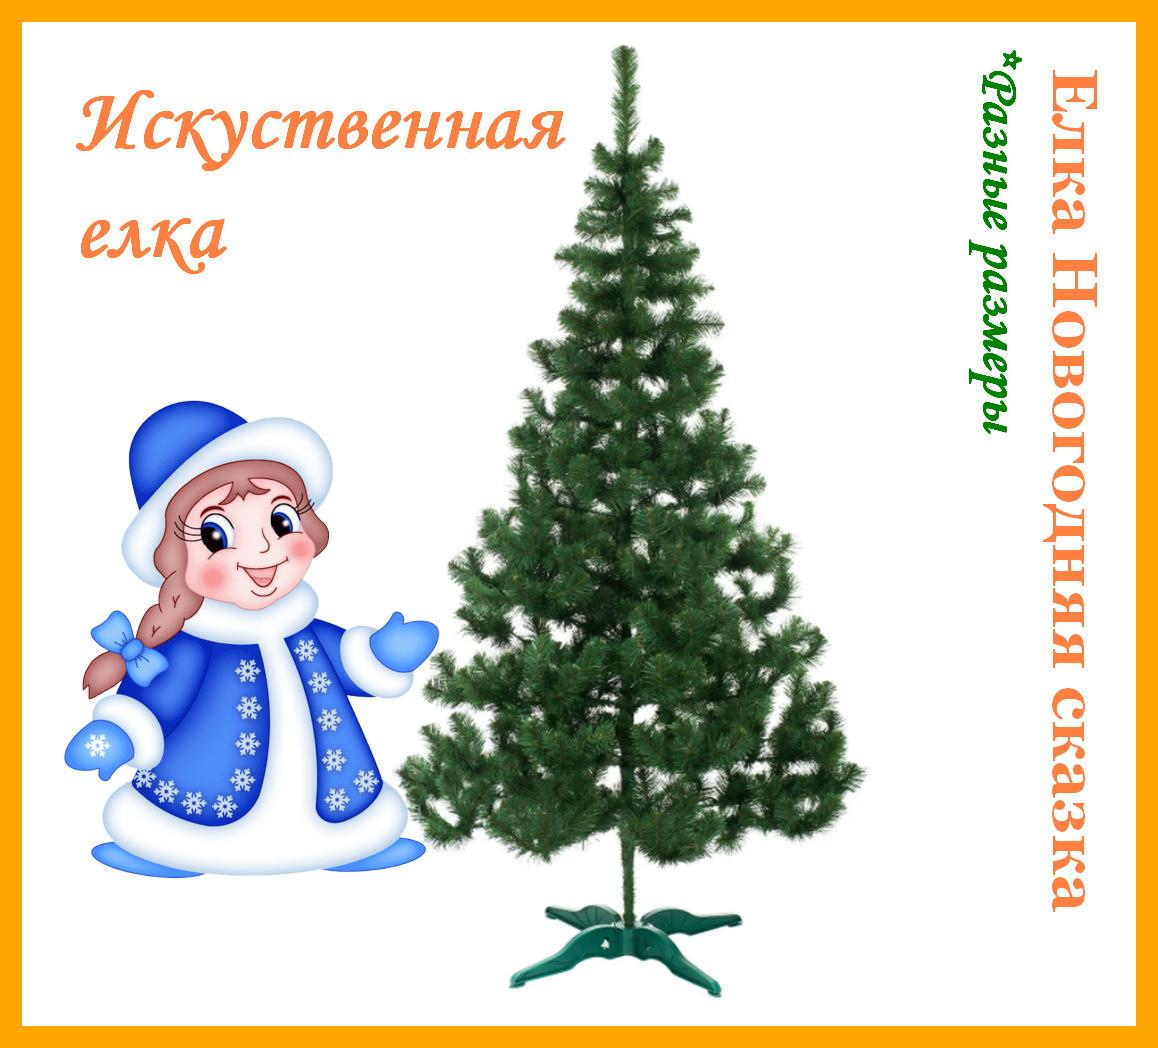 Штучна ЯЛИНКА новорічна КАЗКА 1.8 метра. ЕЛЬ штучне КАЗКА ПВХ 1,8 м. новорічна Ялинка